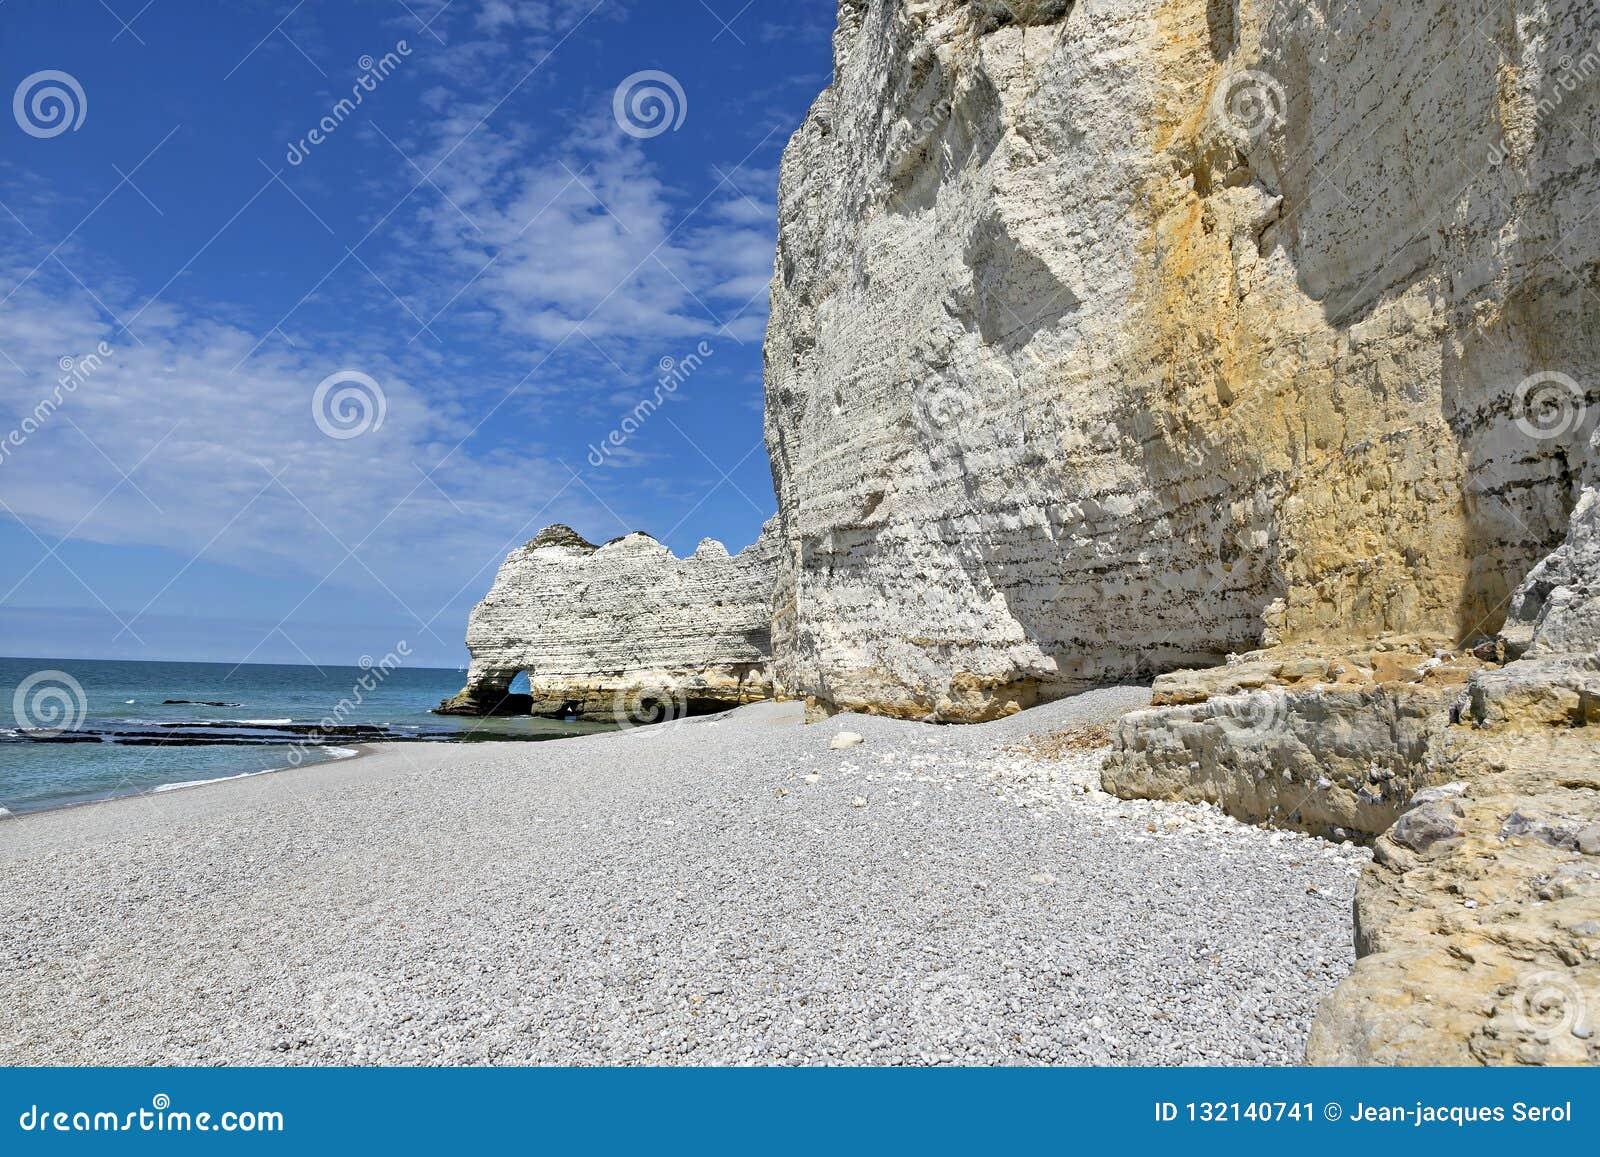 Kiezelsteenstrand en Witte Klippen van Etretat, Normandië, Frankrijk